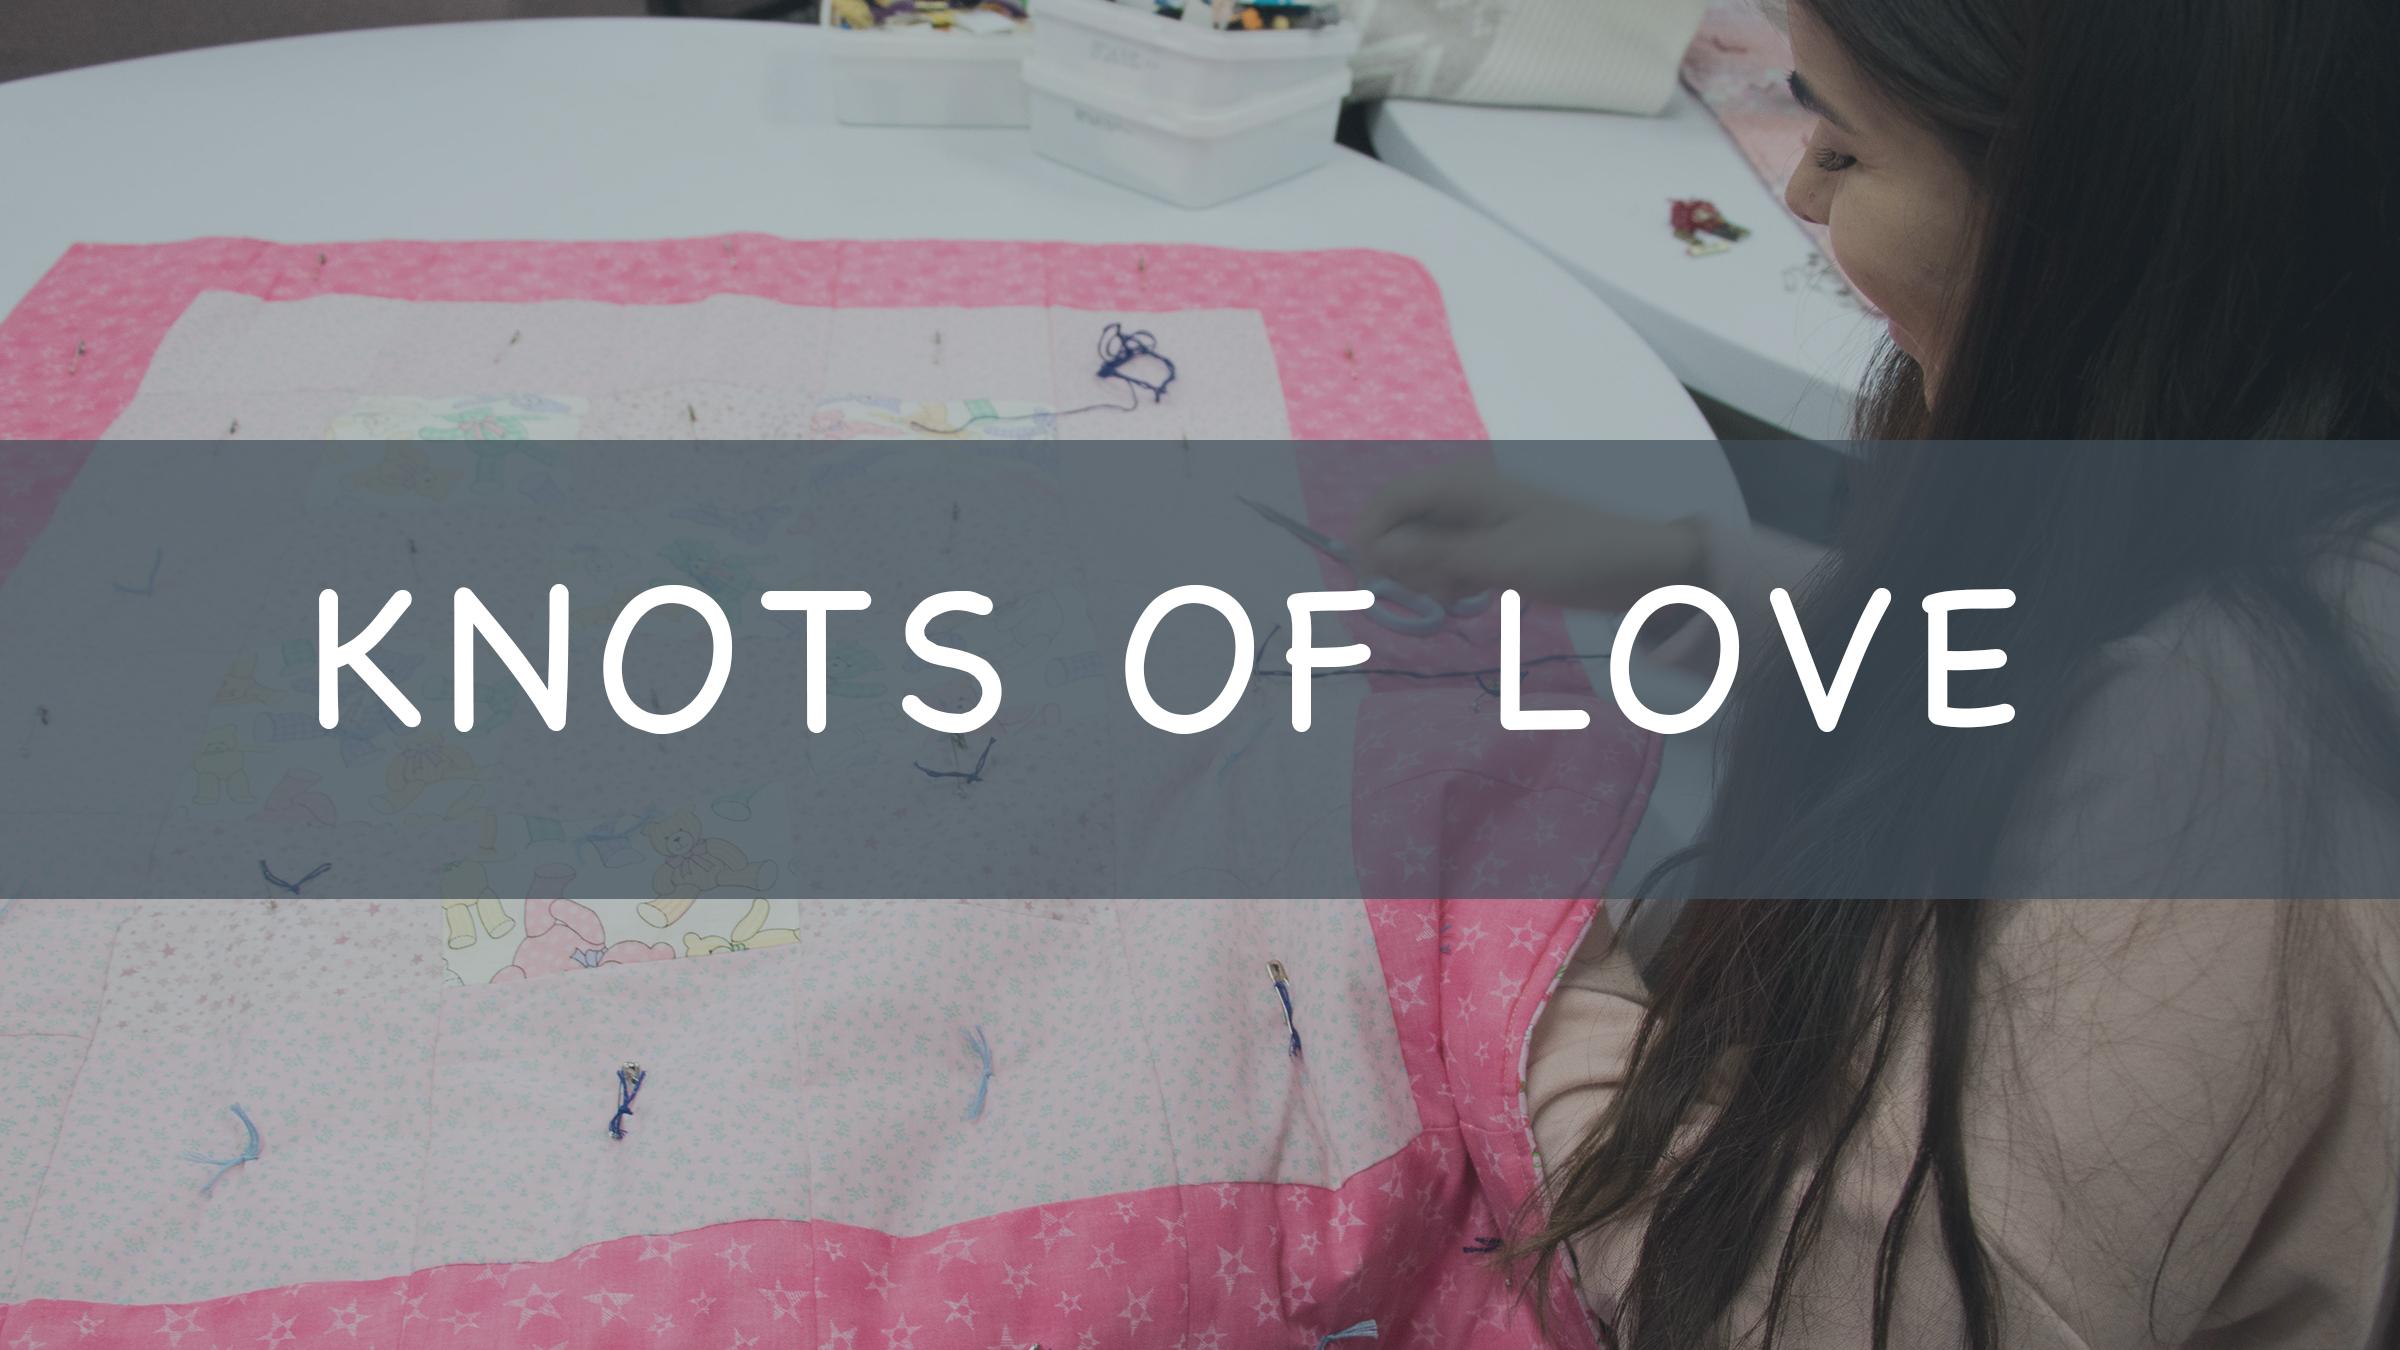 knots-of-love.jpg